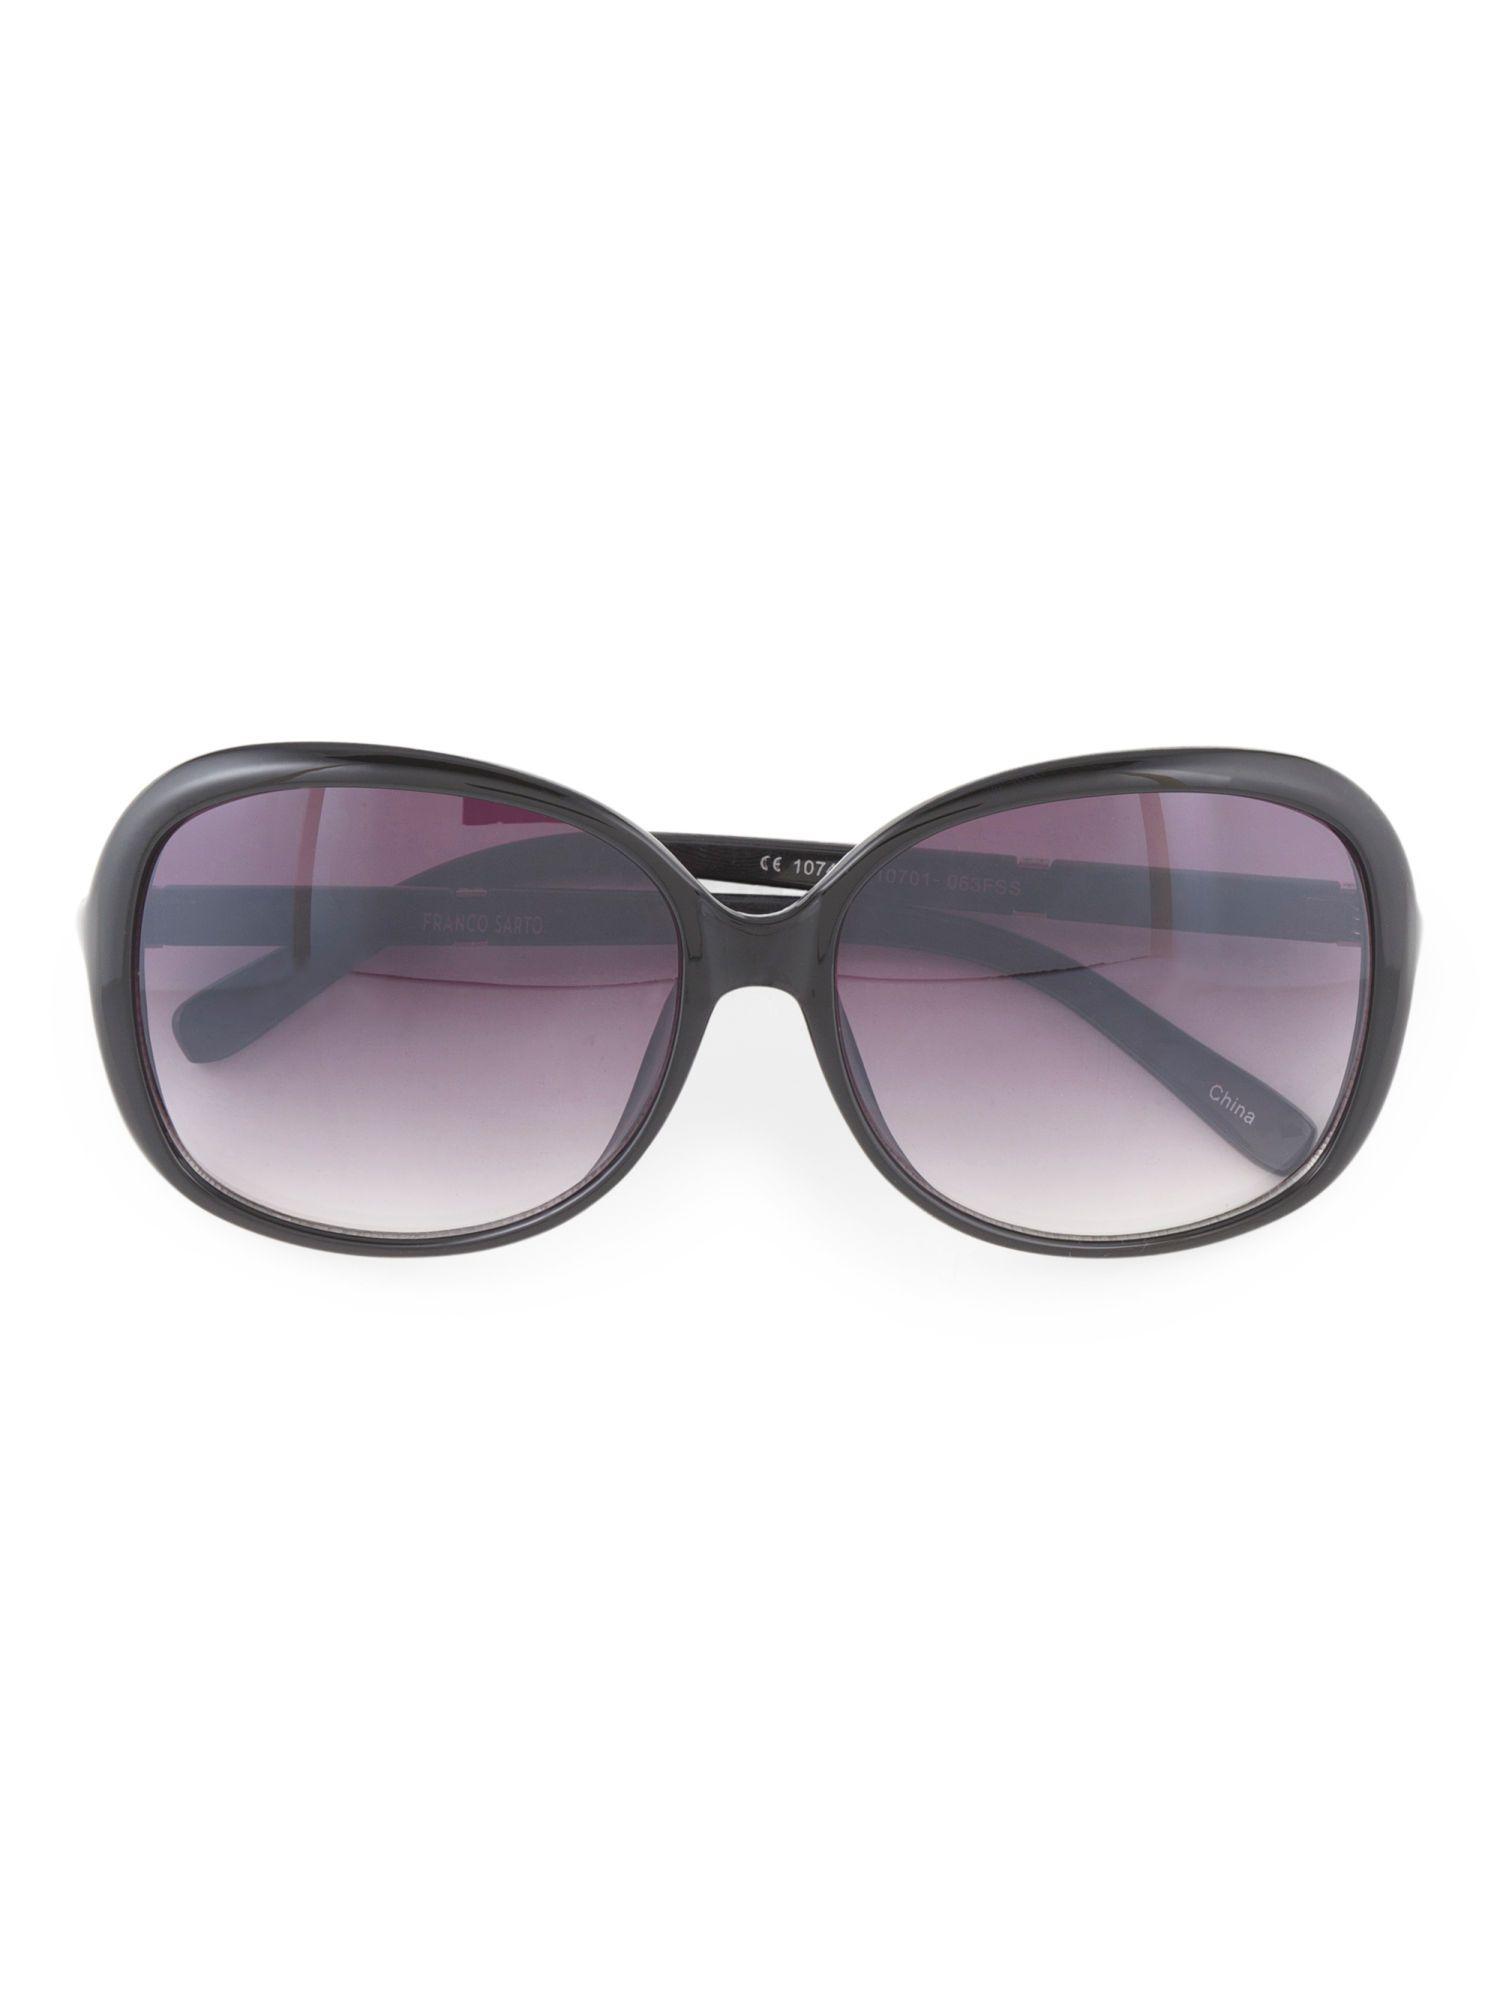 53772816bfb66 Franco Sarto Plastic sunglasses